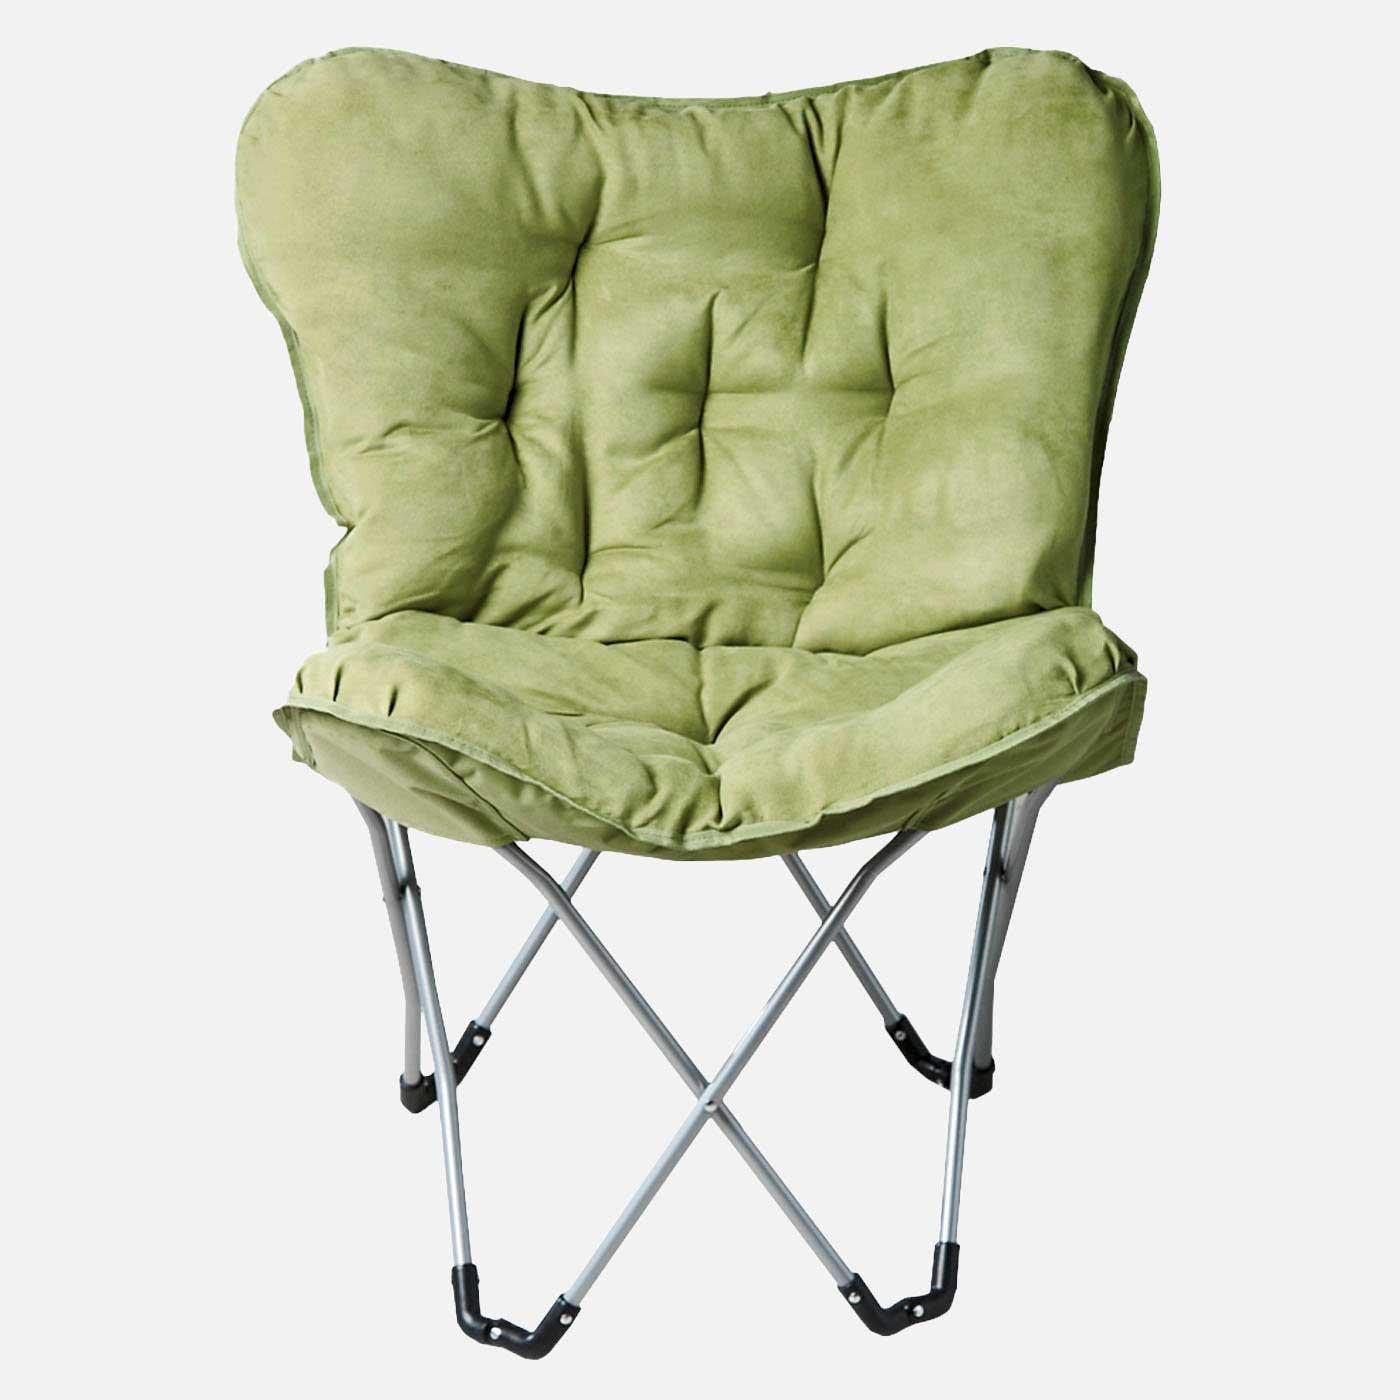 Super Foldong Chairs Facingwalls Creativecarmelina Interior Chair Design Creativecarmelinacom